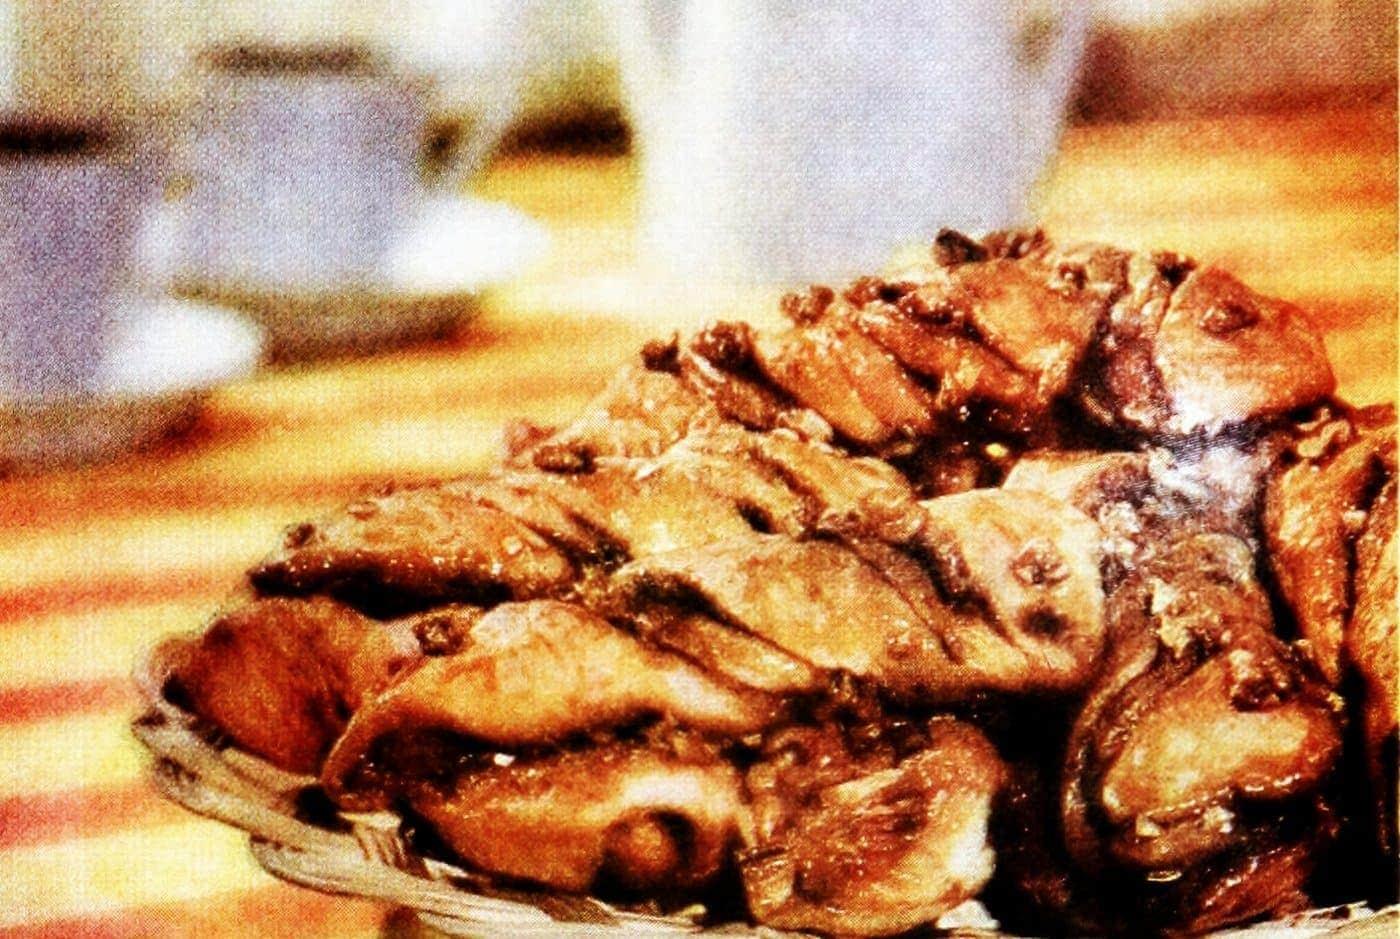 Caramel-pecan cinnamon twist 'coffee breakers' (1959)